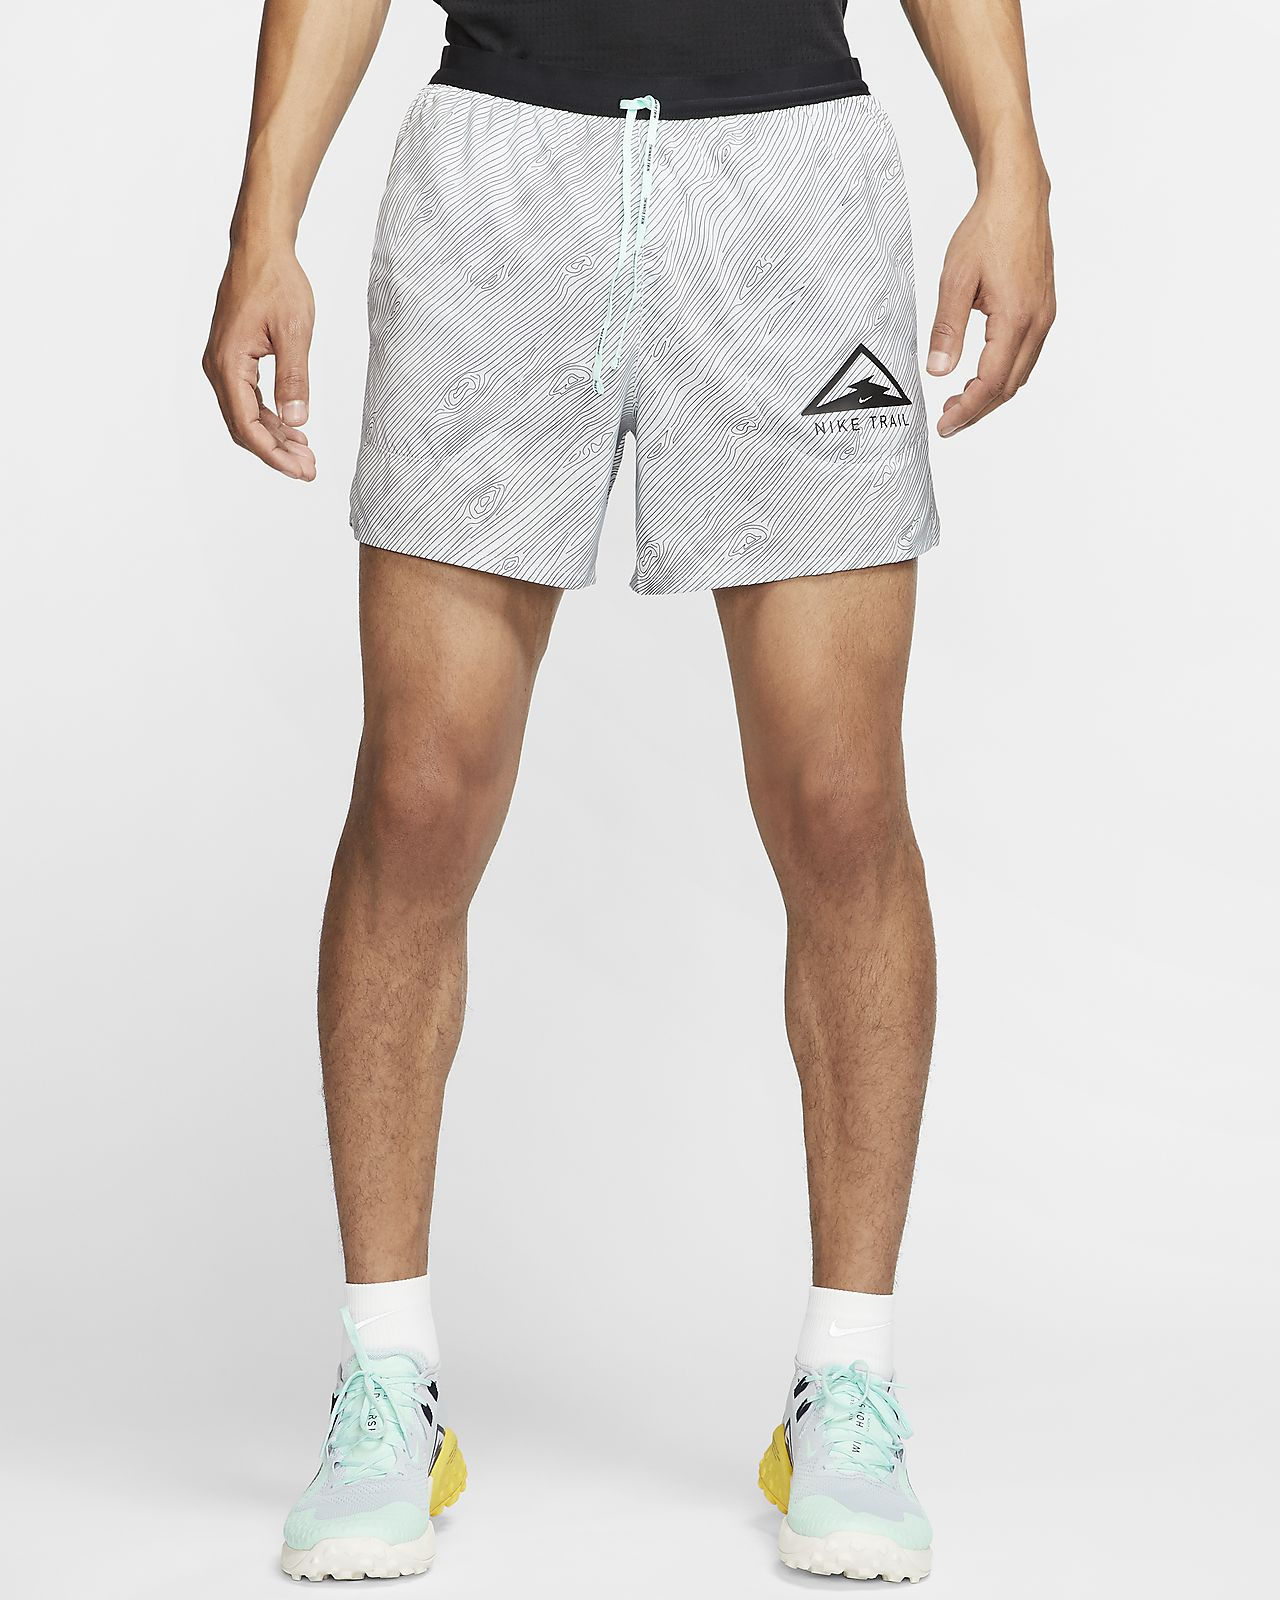 nike trail running apparel